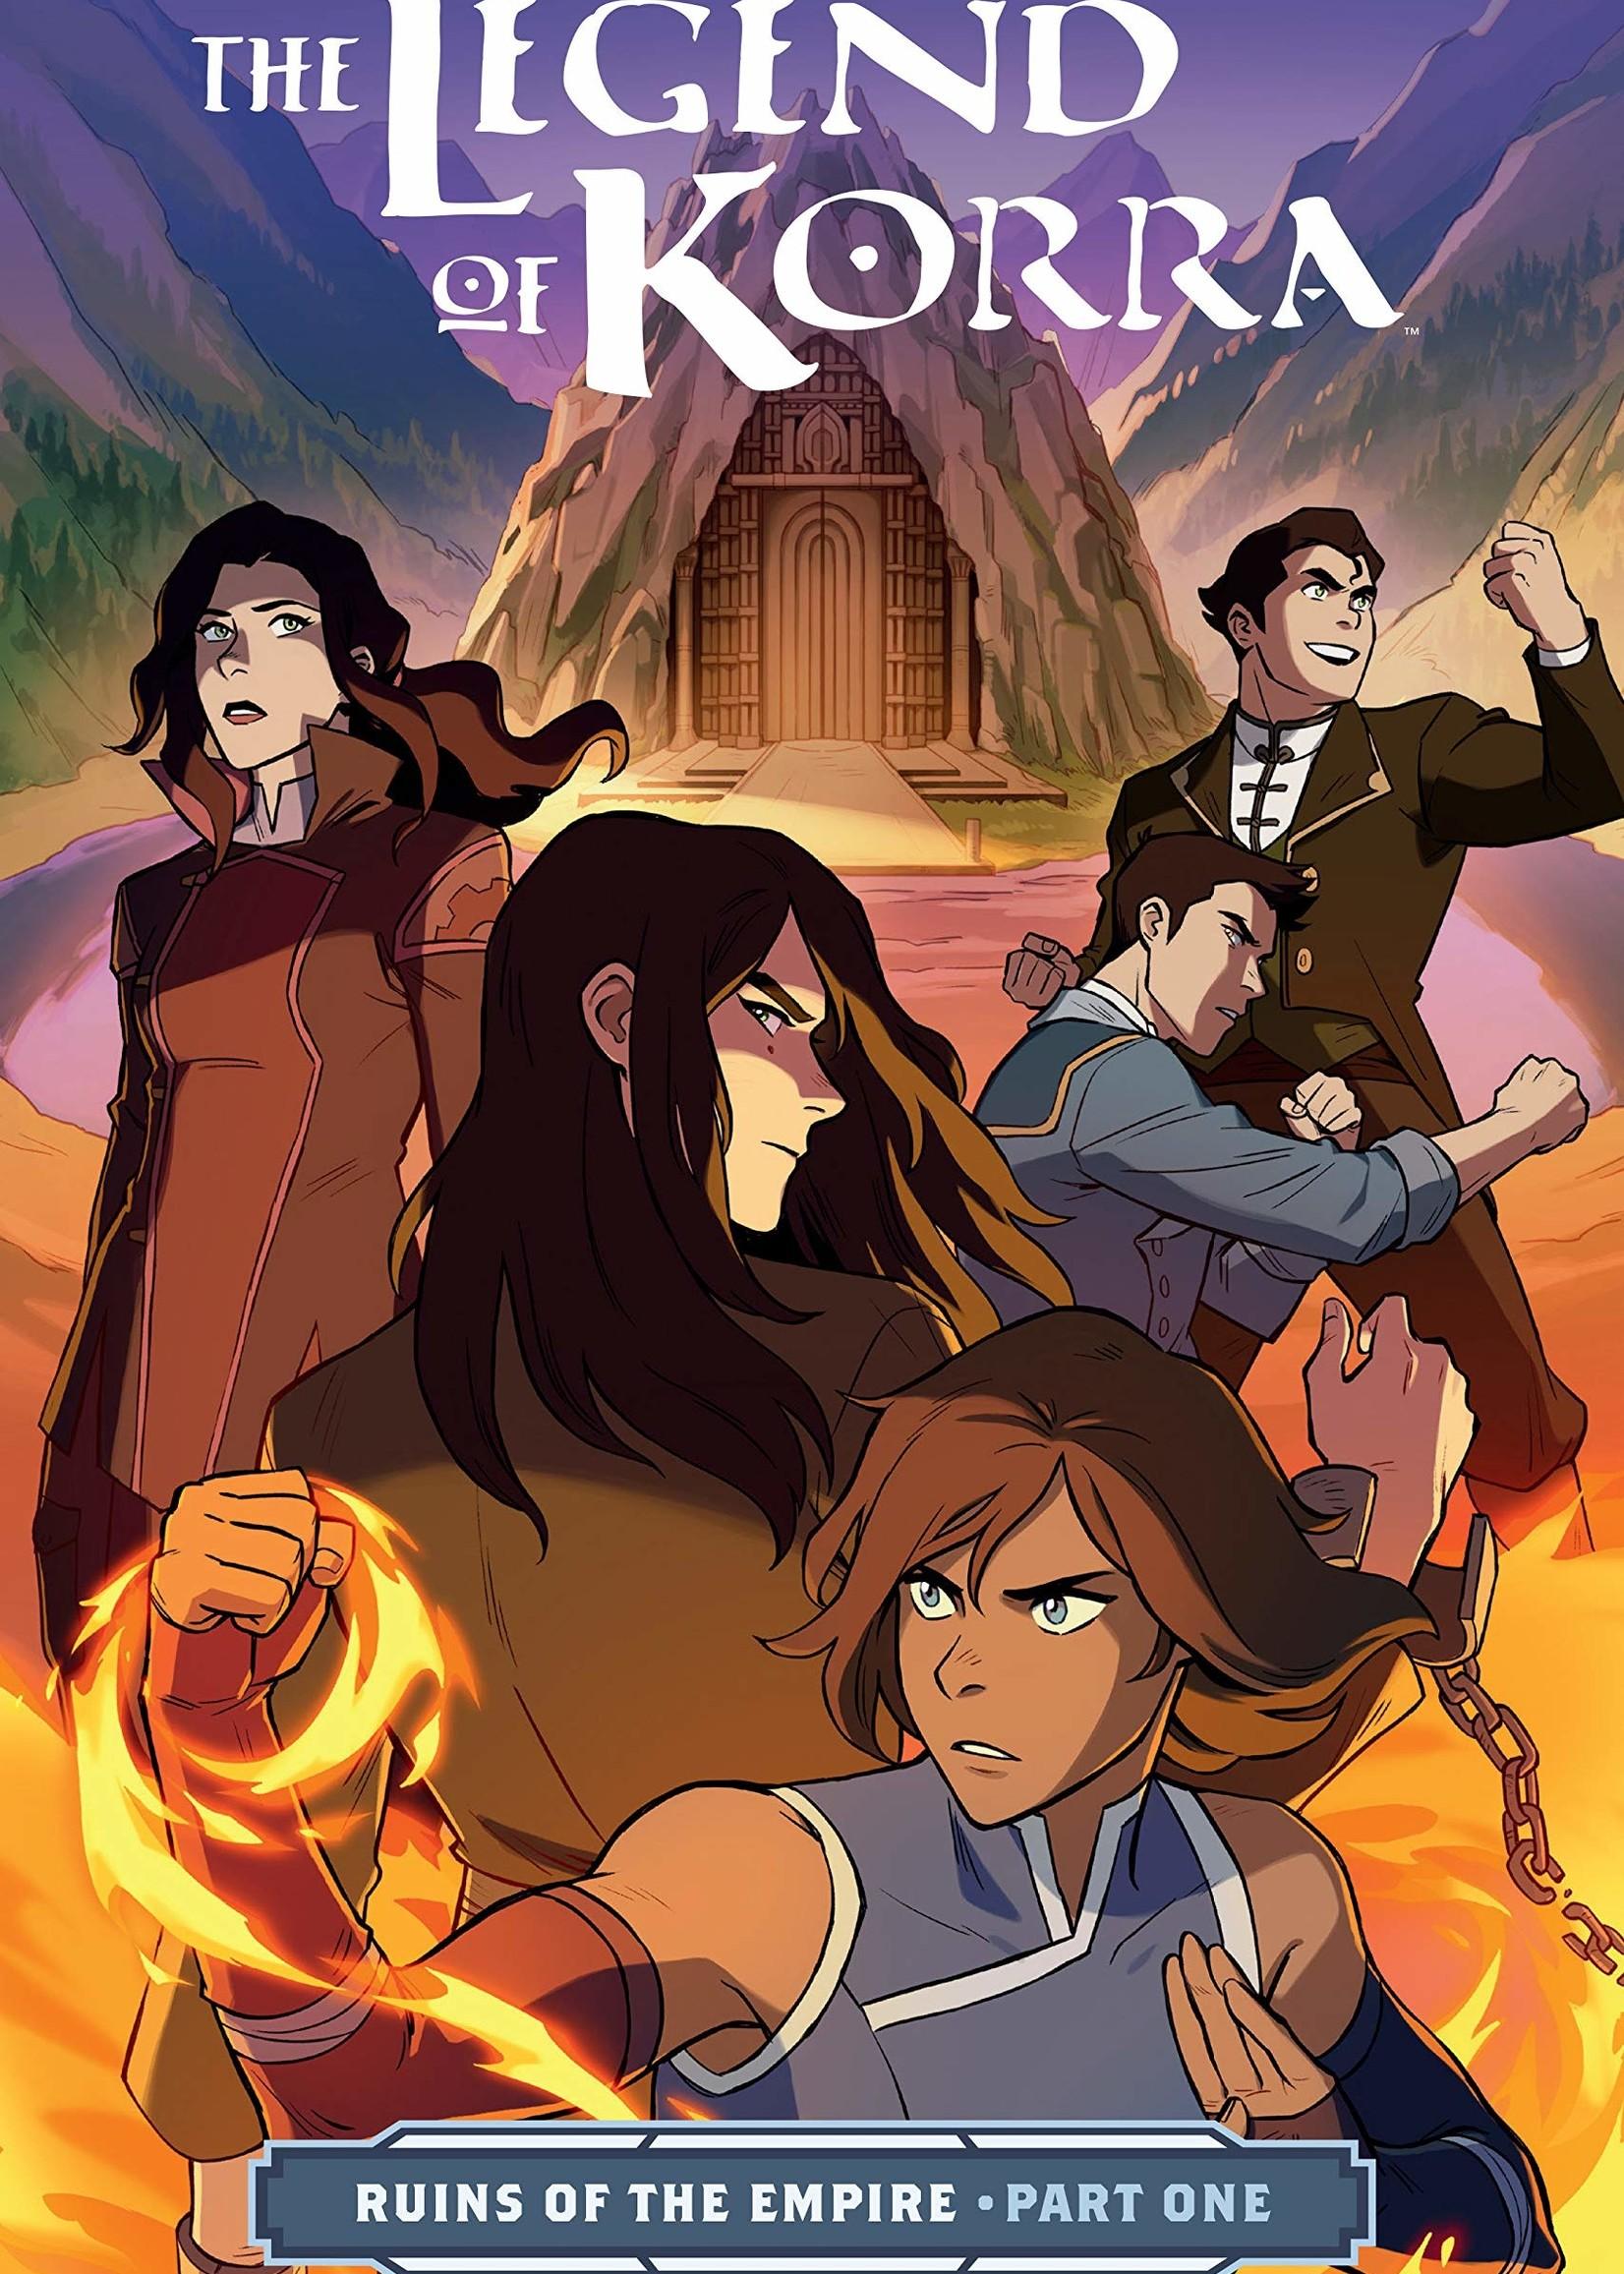 Dark Horse Comics The Legend of Korra Graphic Novel #04, Ruins of the Empire Part 1 - Paperback